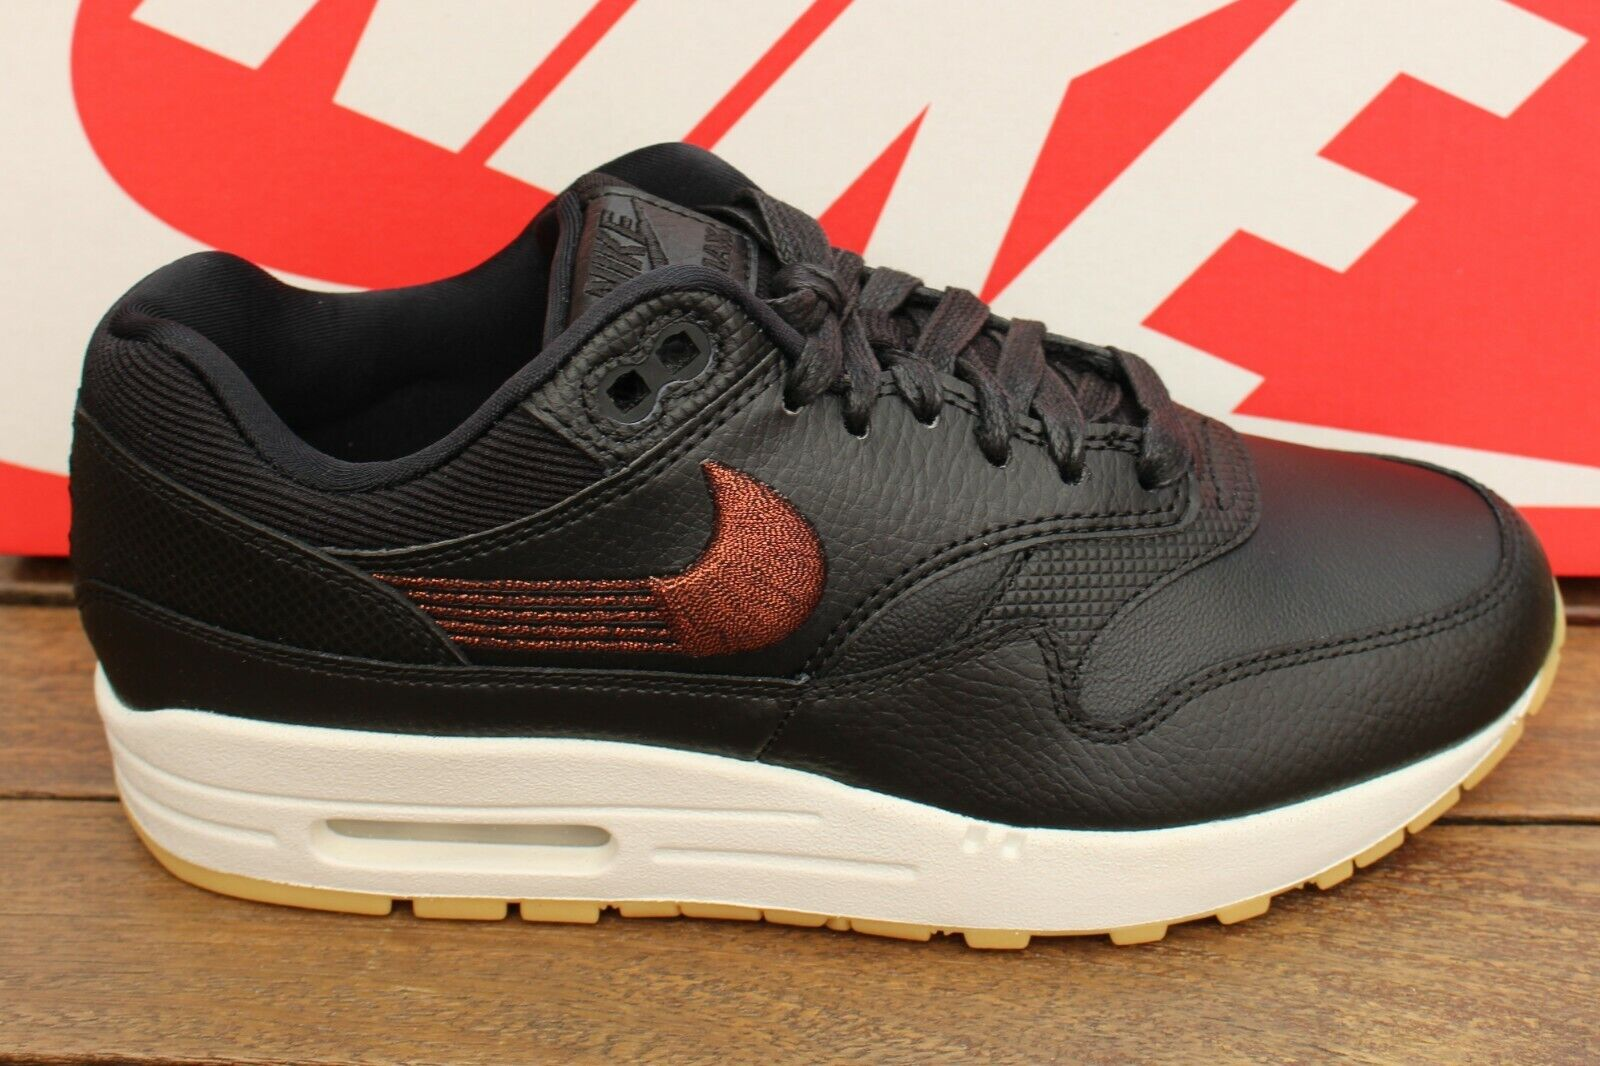 donna Nike Air Max 1 PRM Trainers  454746 -020 UK sz's 4.5  i nuovi stili più caldi